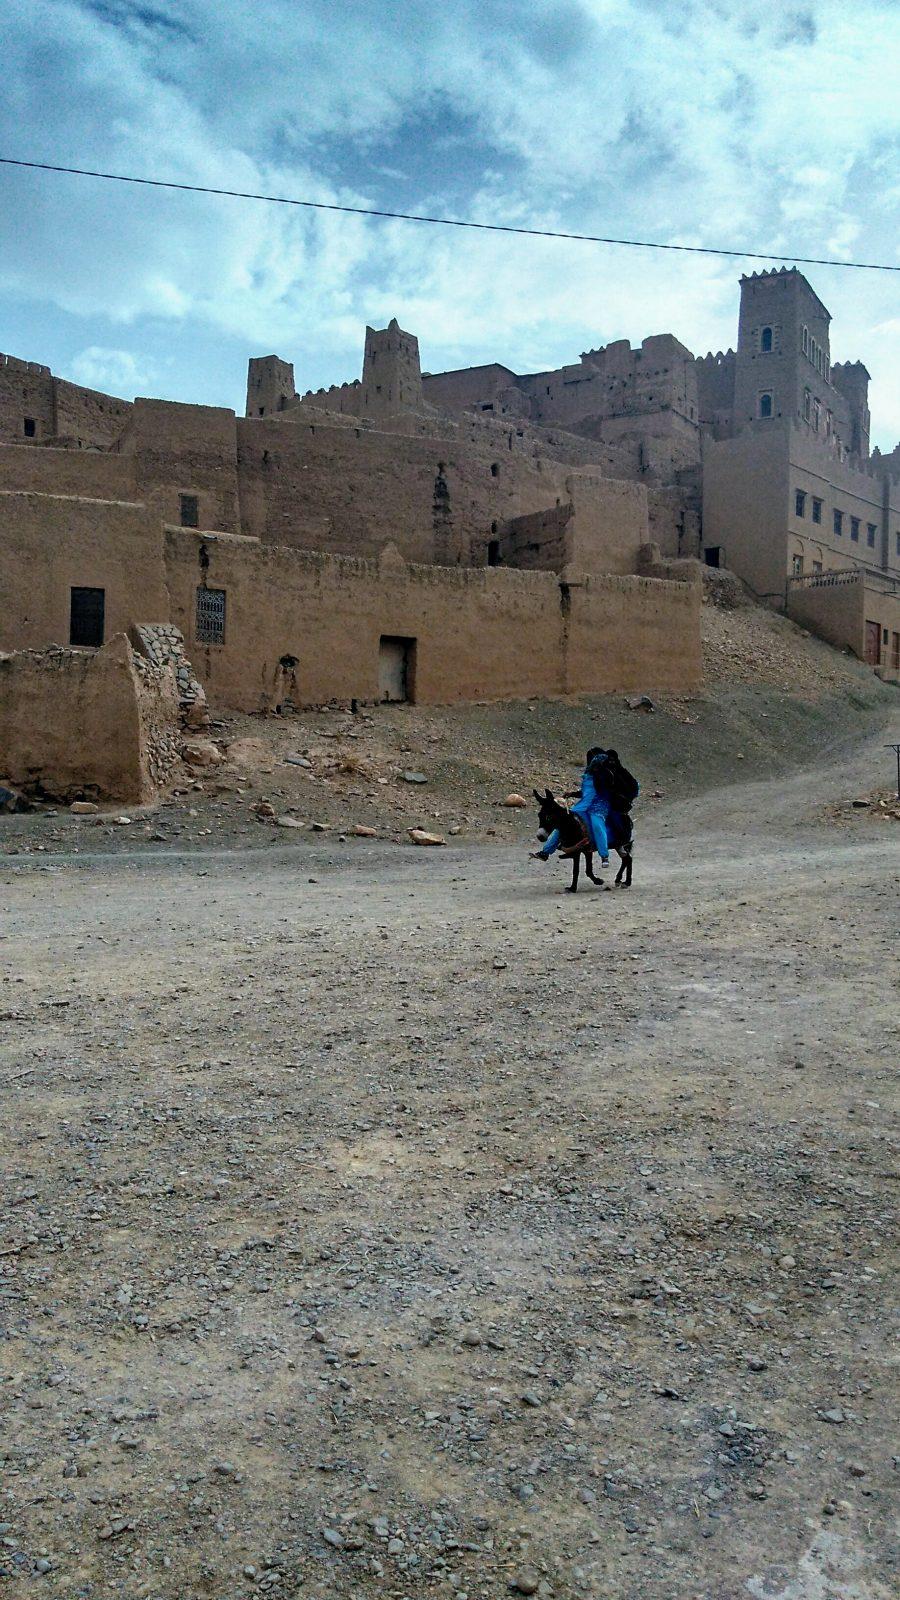 Miss Clov, Rebeca Valdivia, personal shopper, travel, trip, Moroco, Sahara, Atlas, Marrueco, desierto del Sahara, desert, Zagora